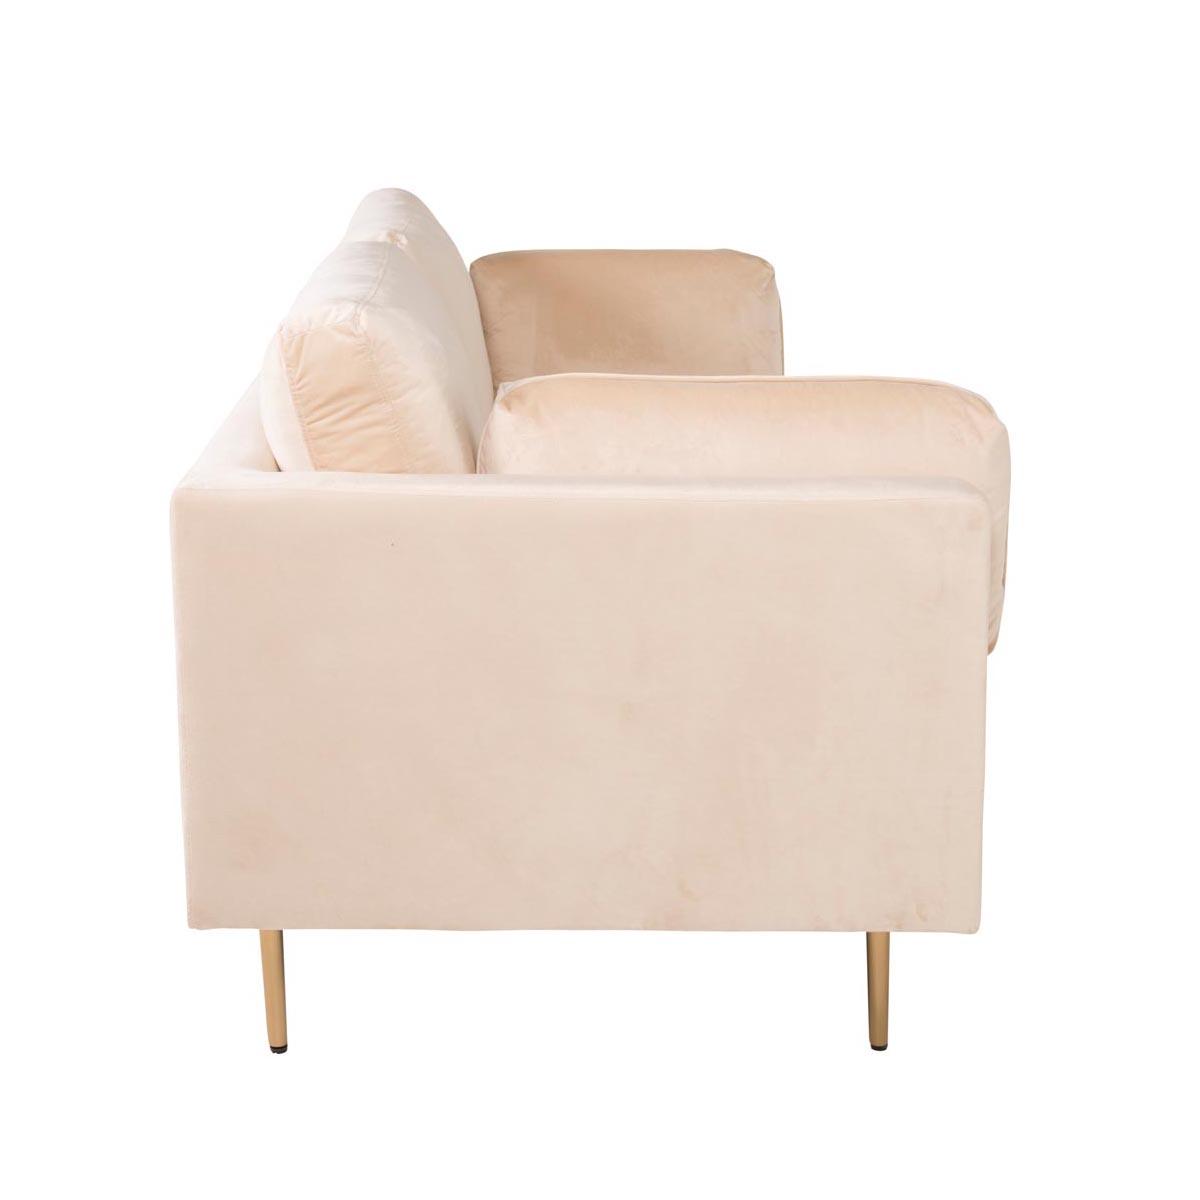 Boom-3-sits-soffa-offwhite-sammet-sida-18045-980